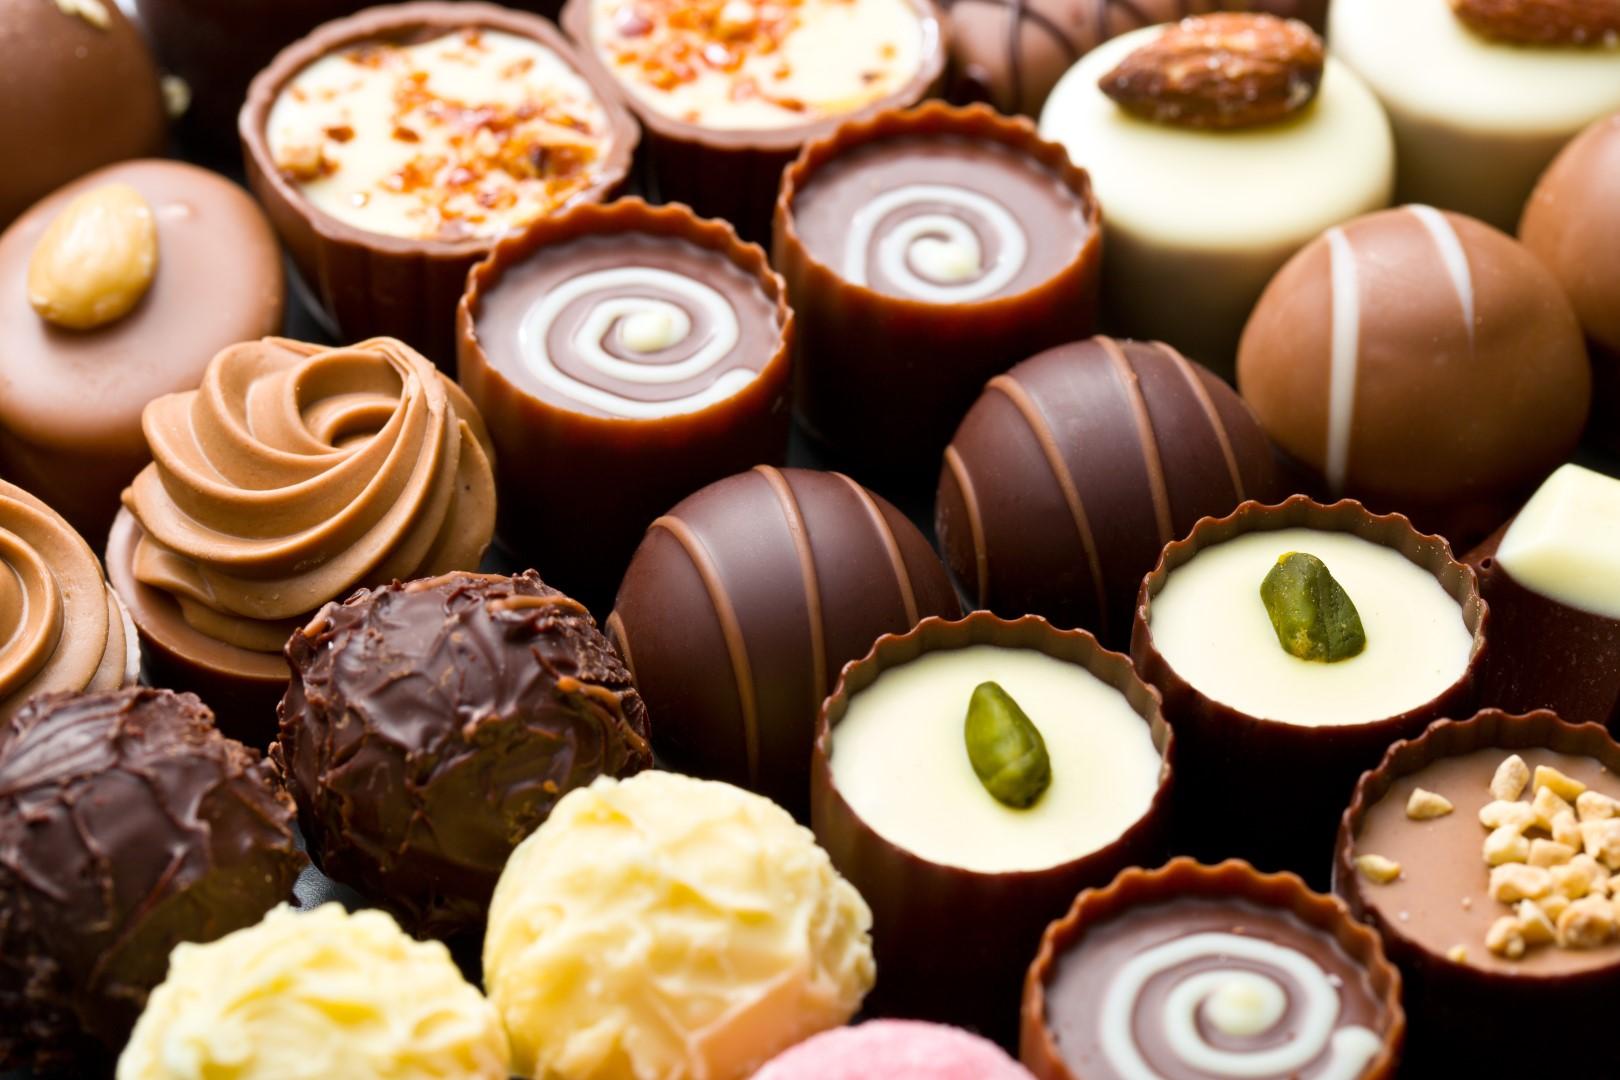 1912-1920 – Bonbons